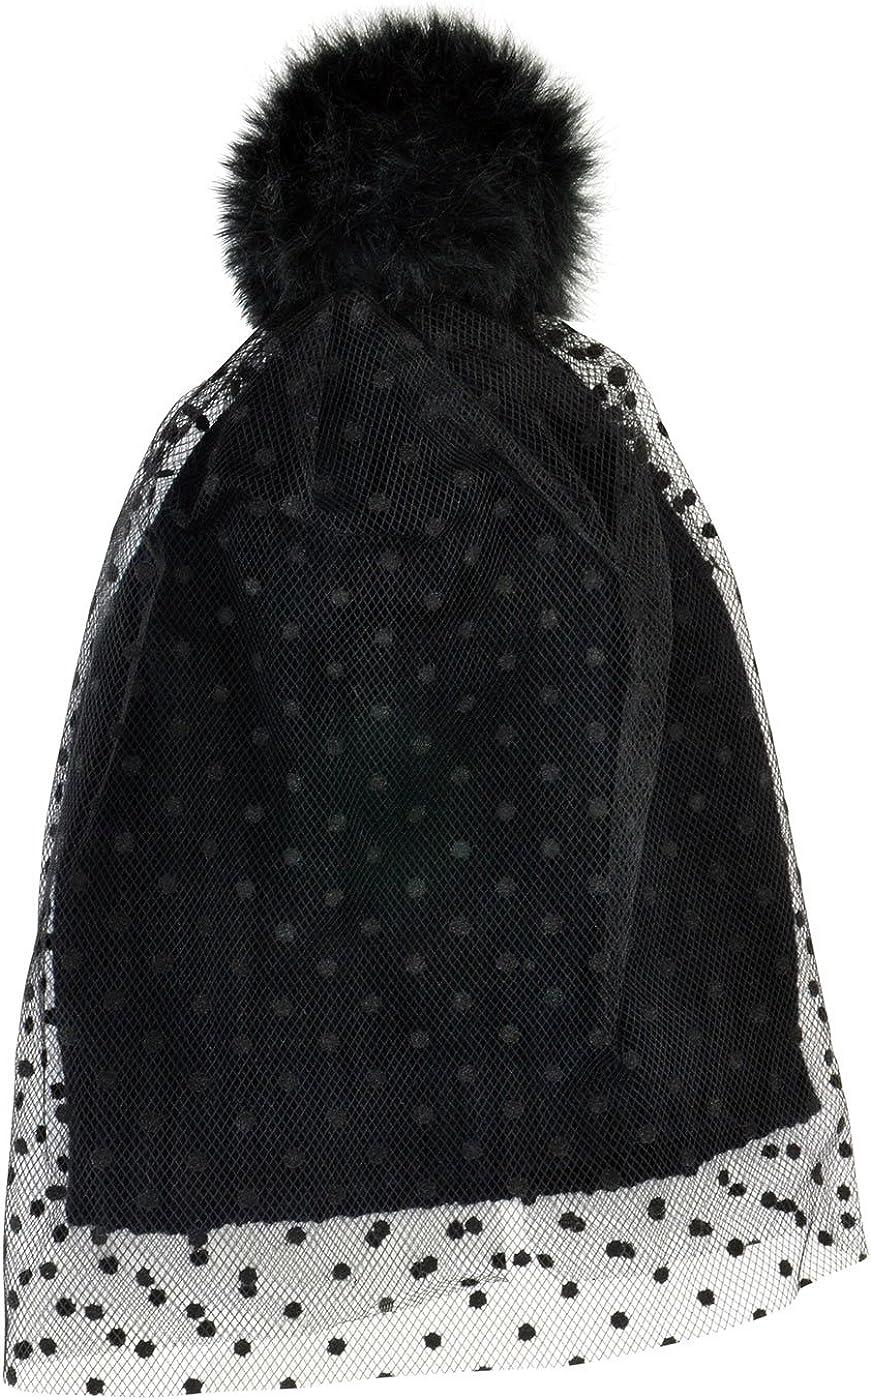 Girls Womens Cute Fun Toque Ski Winter Warm Neon Eaters Knit Beanie Hat with Veil Black